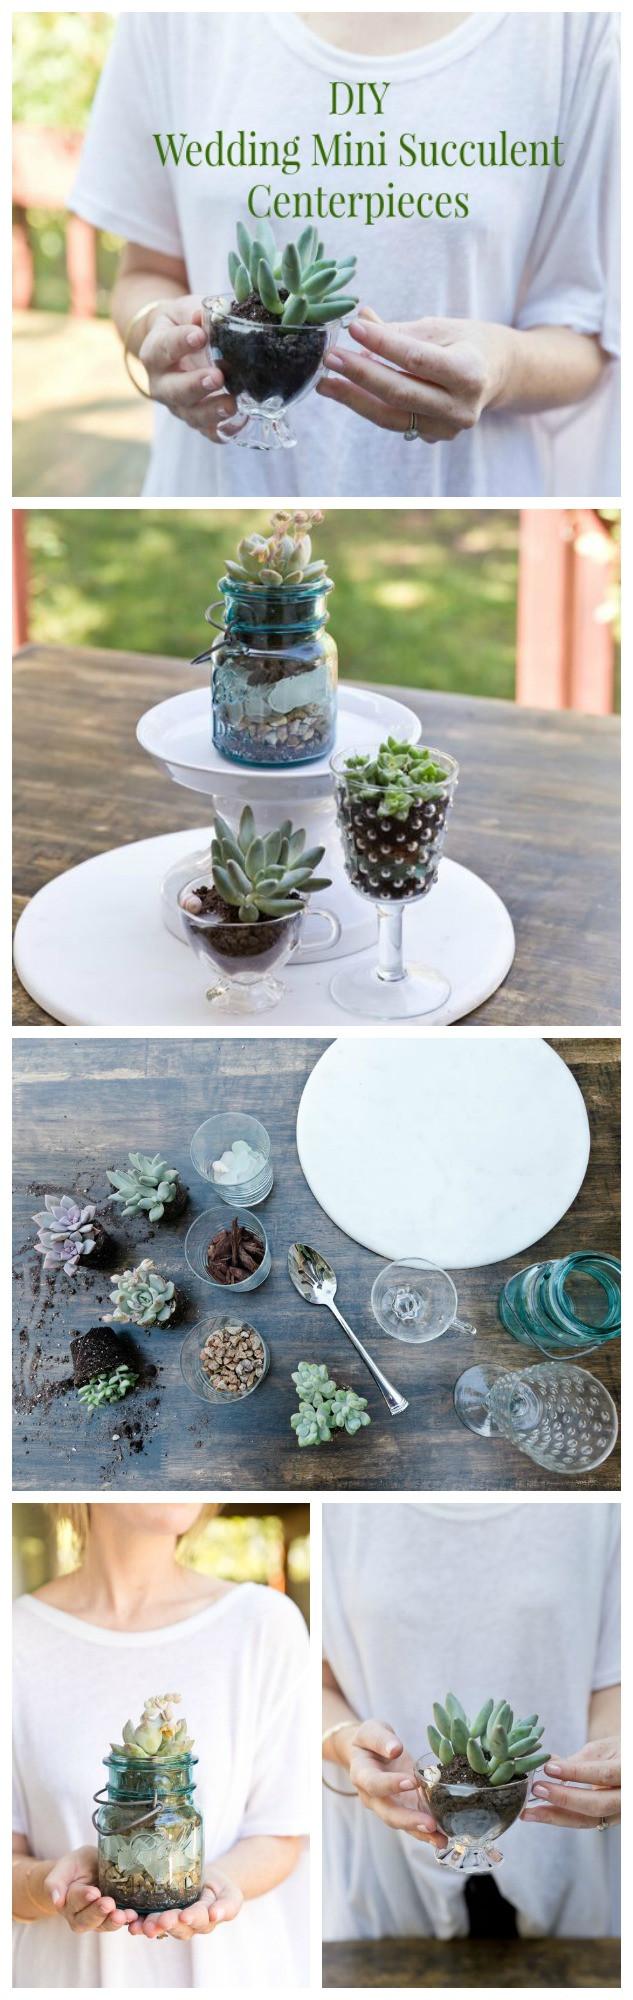 Best ideas about DIY Wedding Centerpieces . Save or Pin DIY Wedding Succulent Centerpieces Rustic Wedding Chic Now.